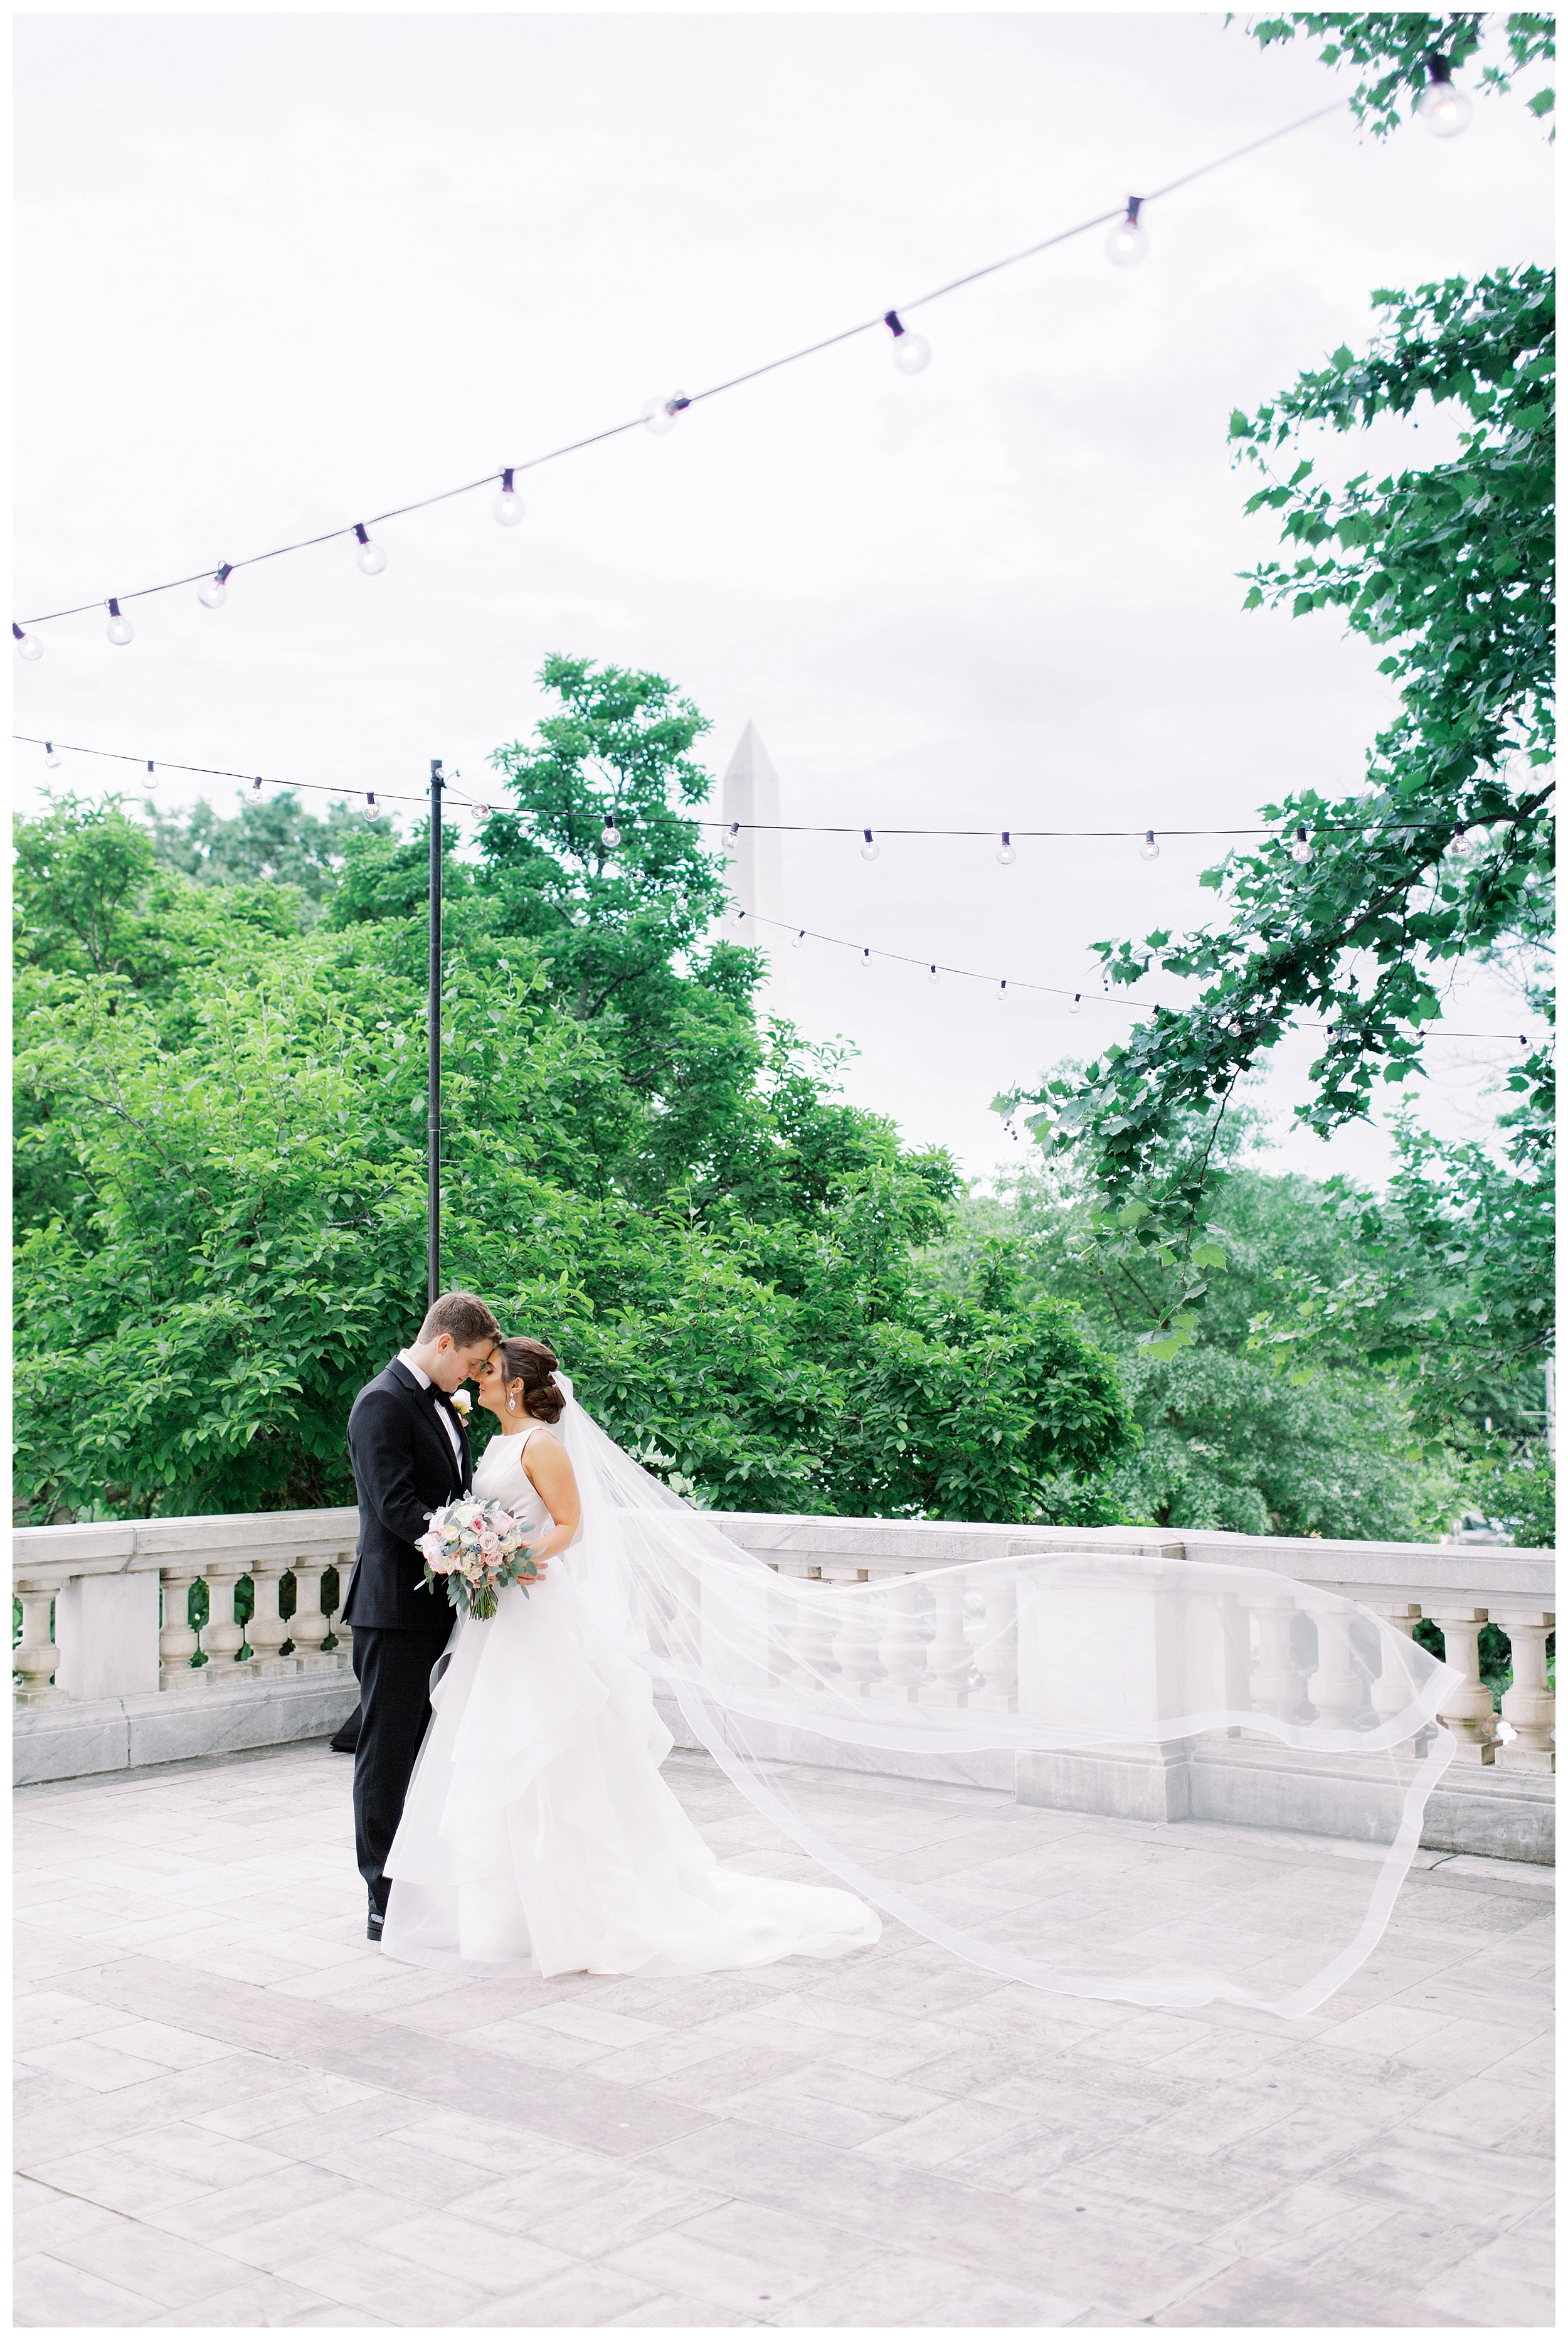 DAR Constitution Hall Wedding Wedding | Daughters of the American Revolution Wedding | District of Columbia Film Wedding Photographer Kir Tuben_0085.jpg